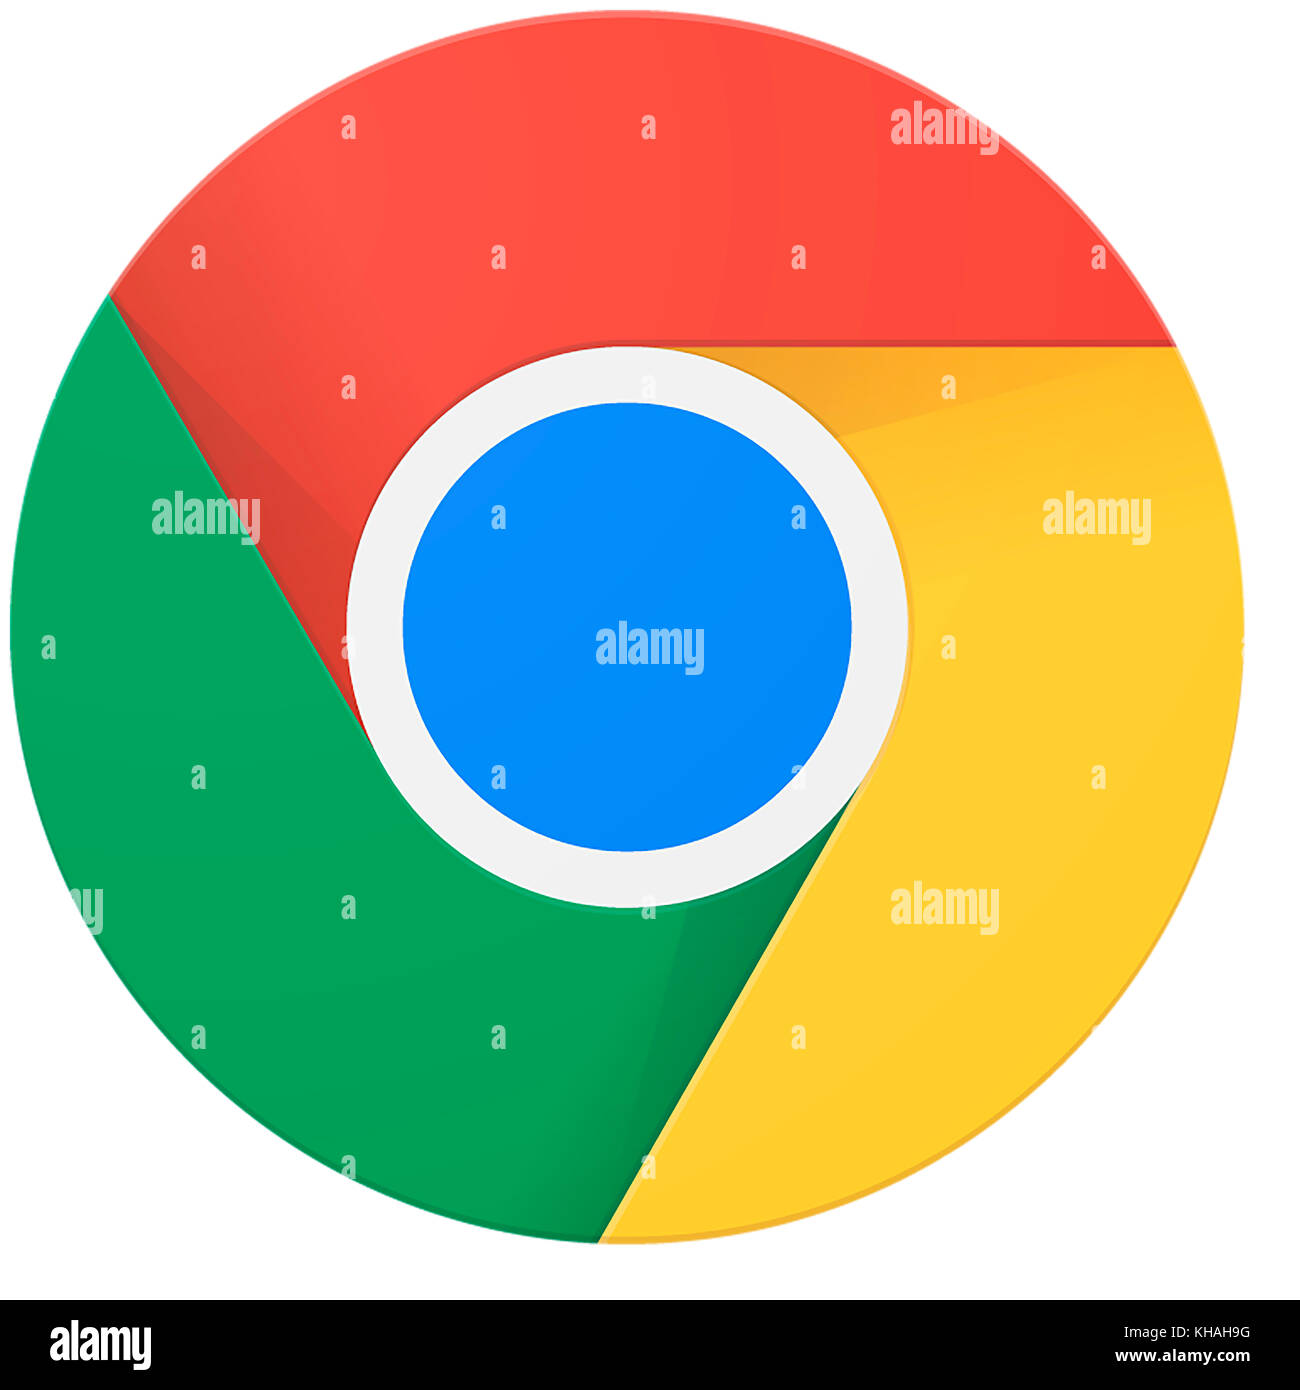 Google Chrome Logo, Web Browser from Google - Stock Image